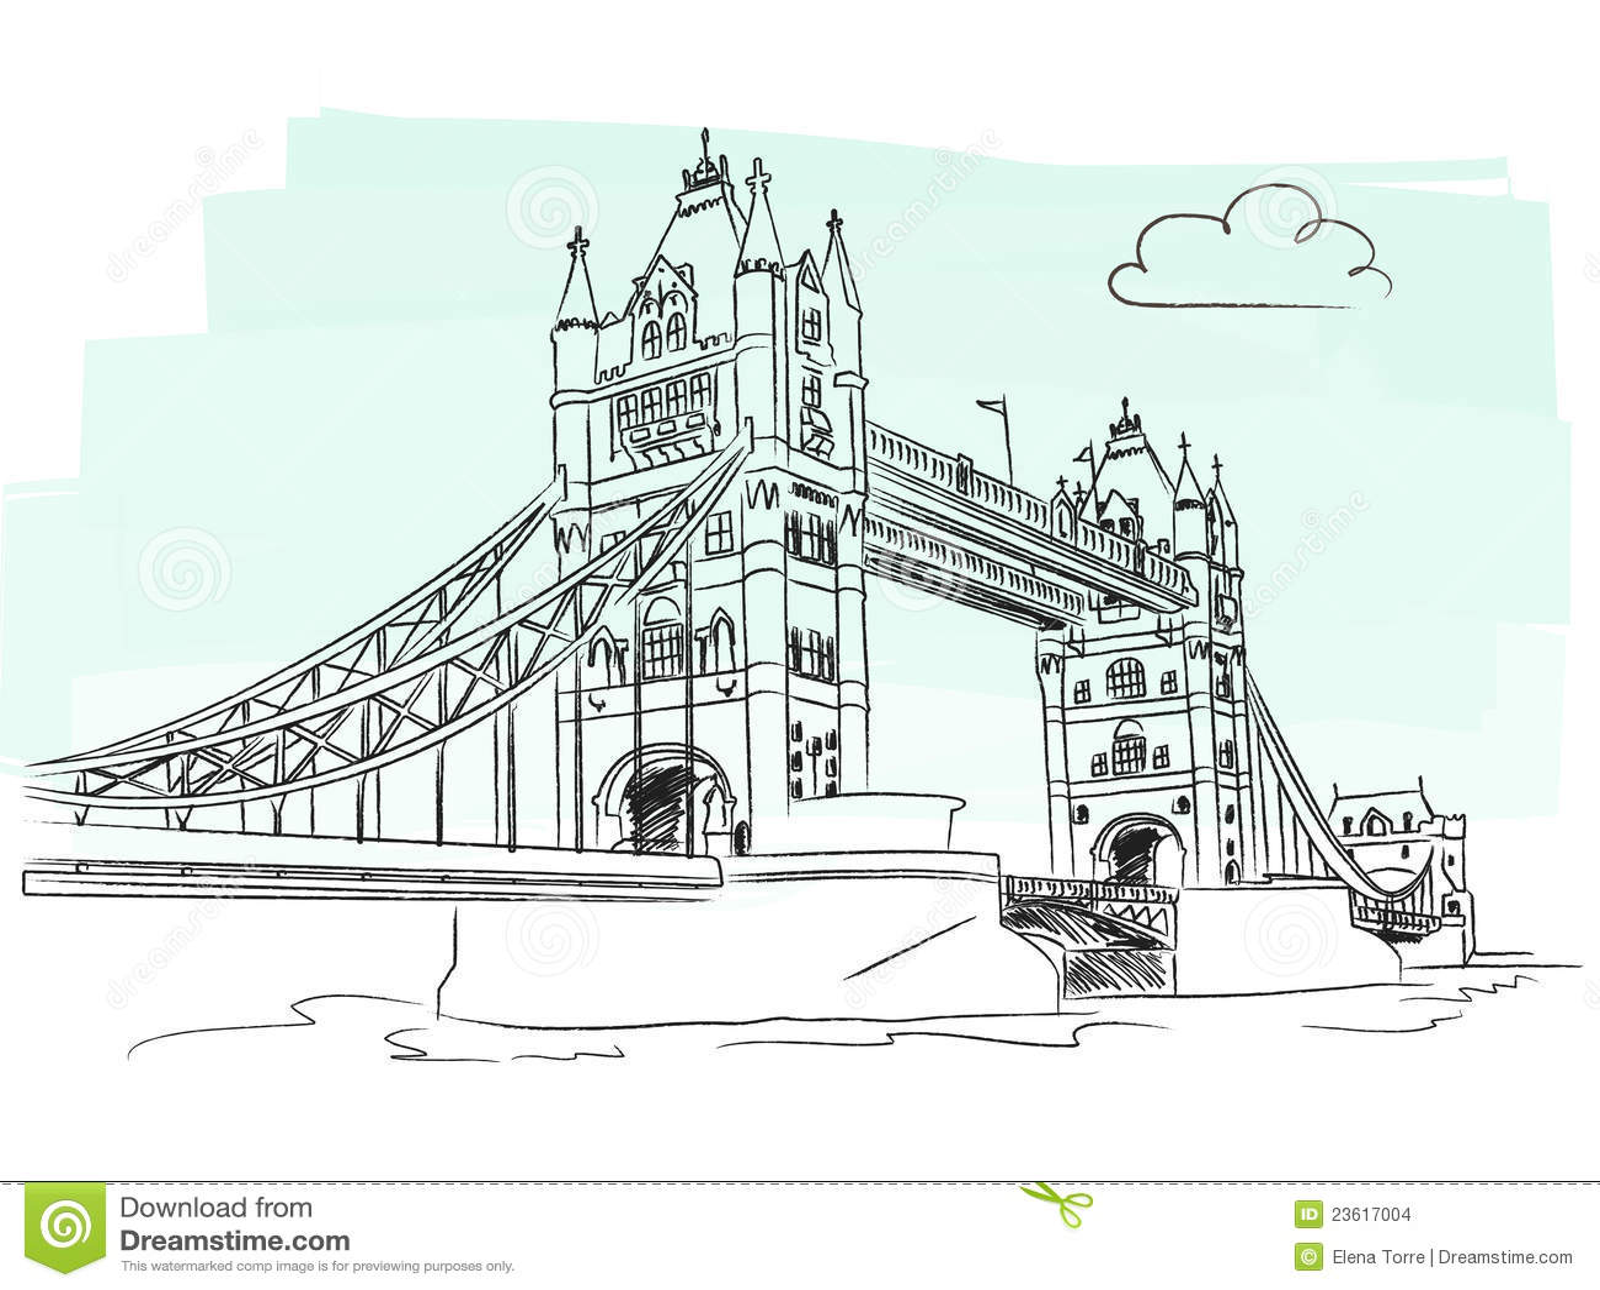 London Tower Bridge Vector Stock Vector. Image Of London - 23617004